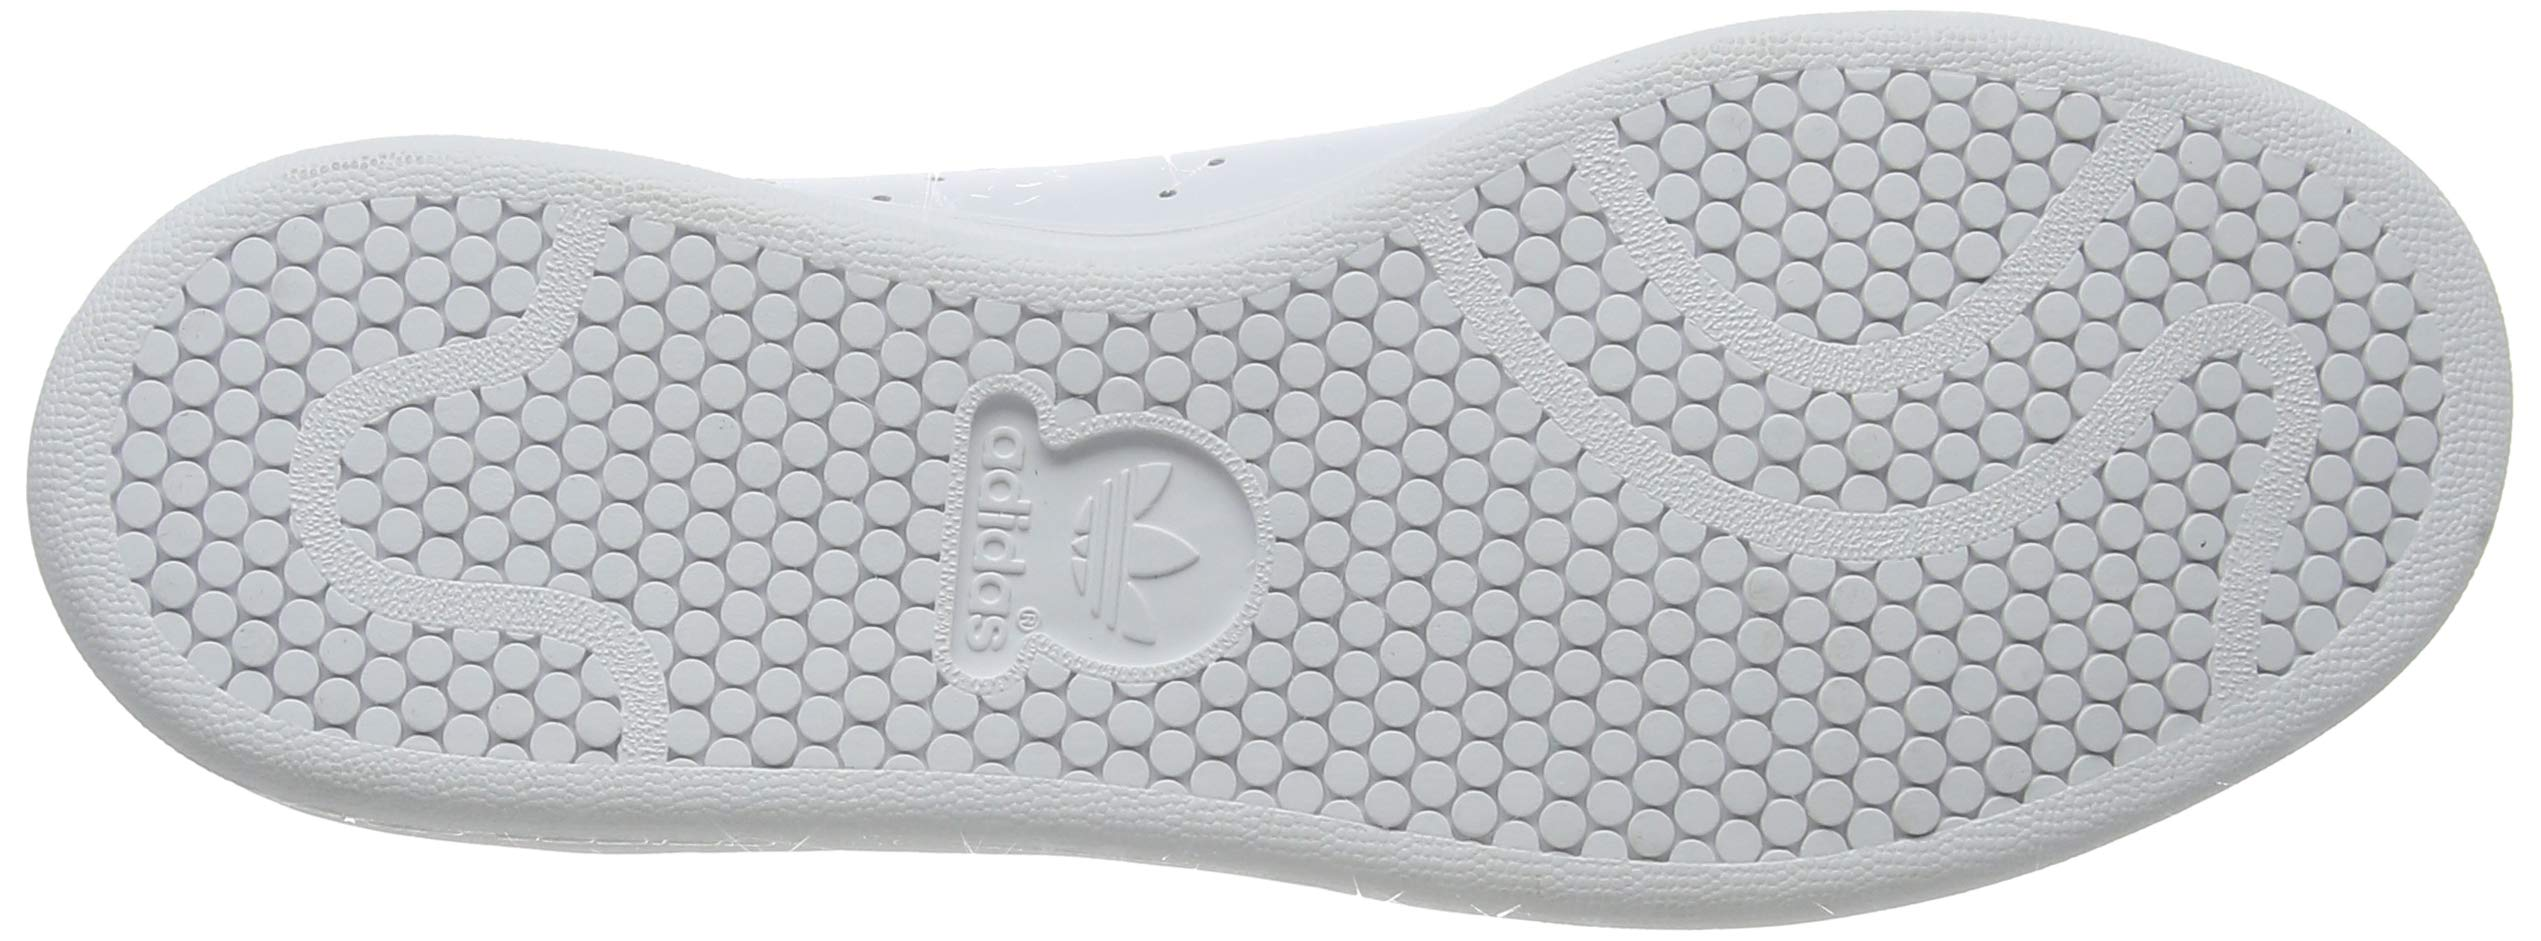 adidas Originals Stan Smith, Scarpe da Ginnastica Unisex – Adulto 3 spesavip